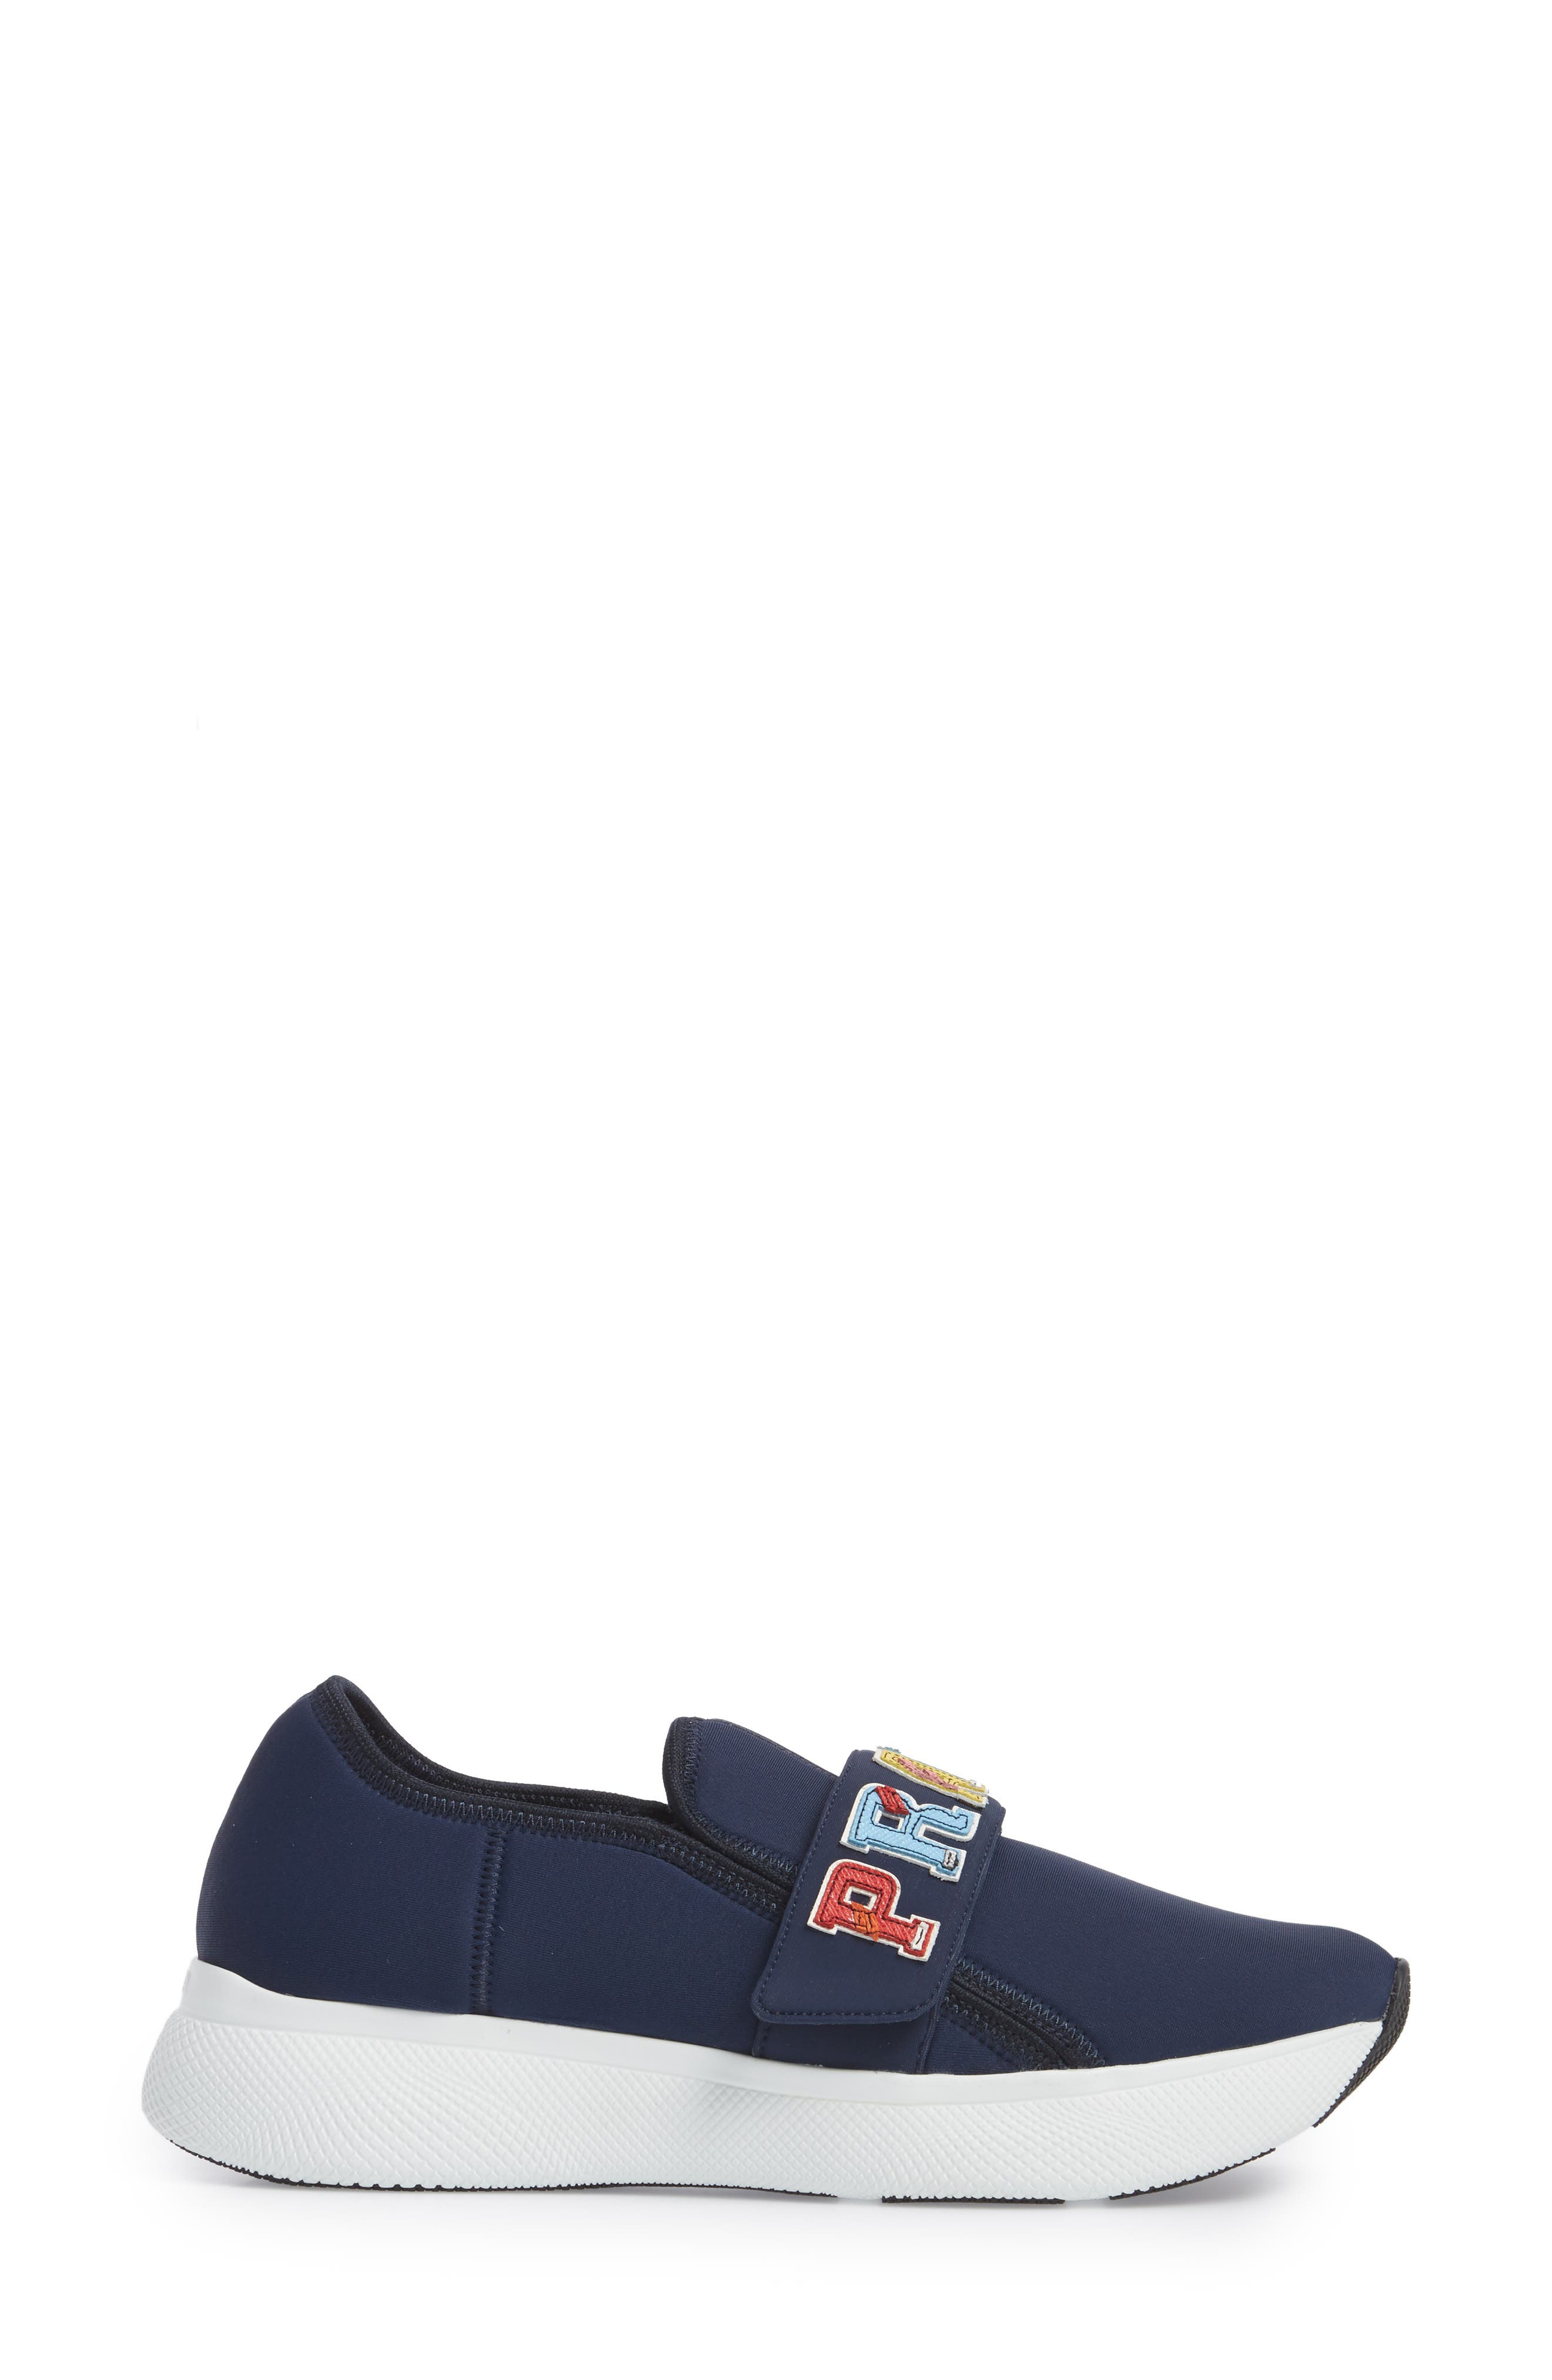 Alternate Image 3  - Prada Logo Strap Low Top Sneaker (Women)